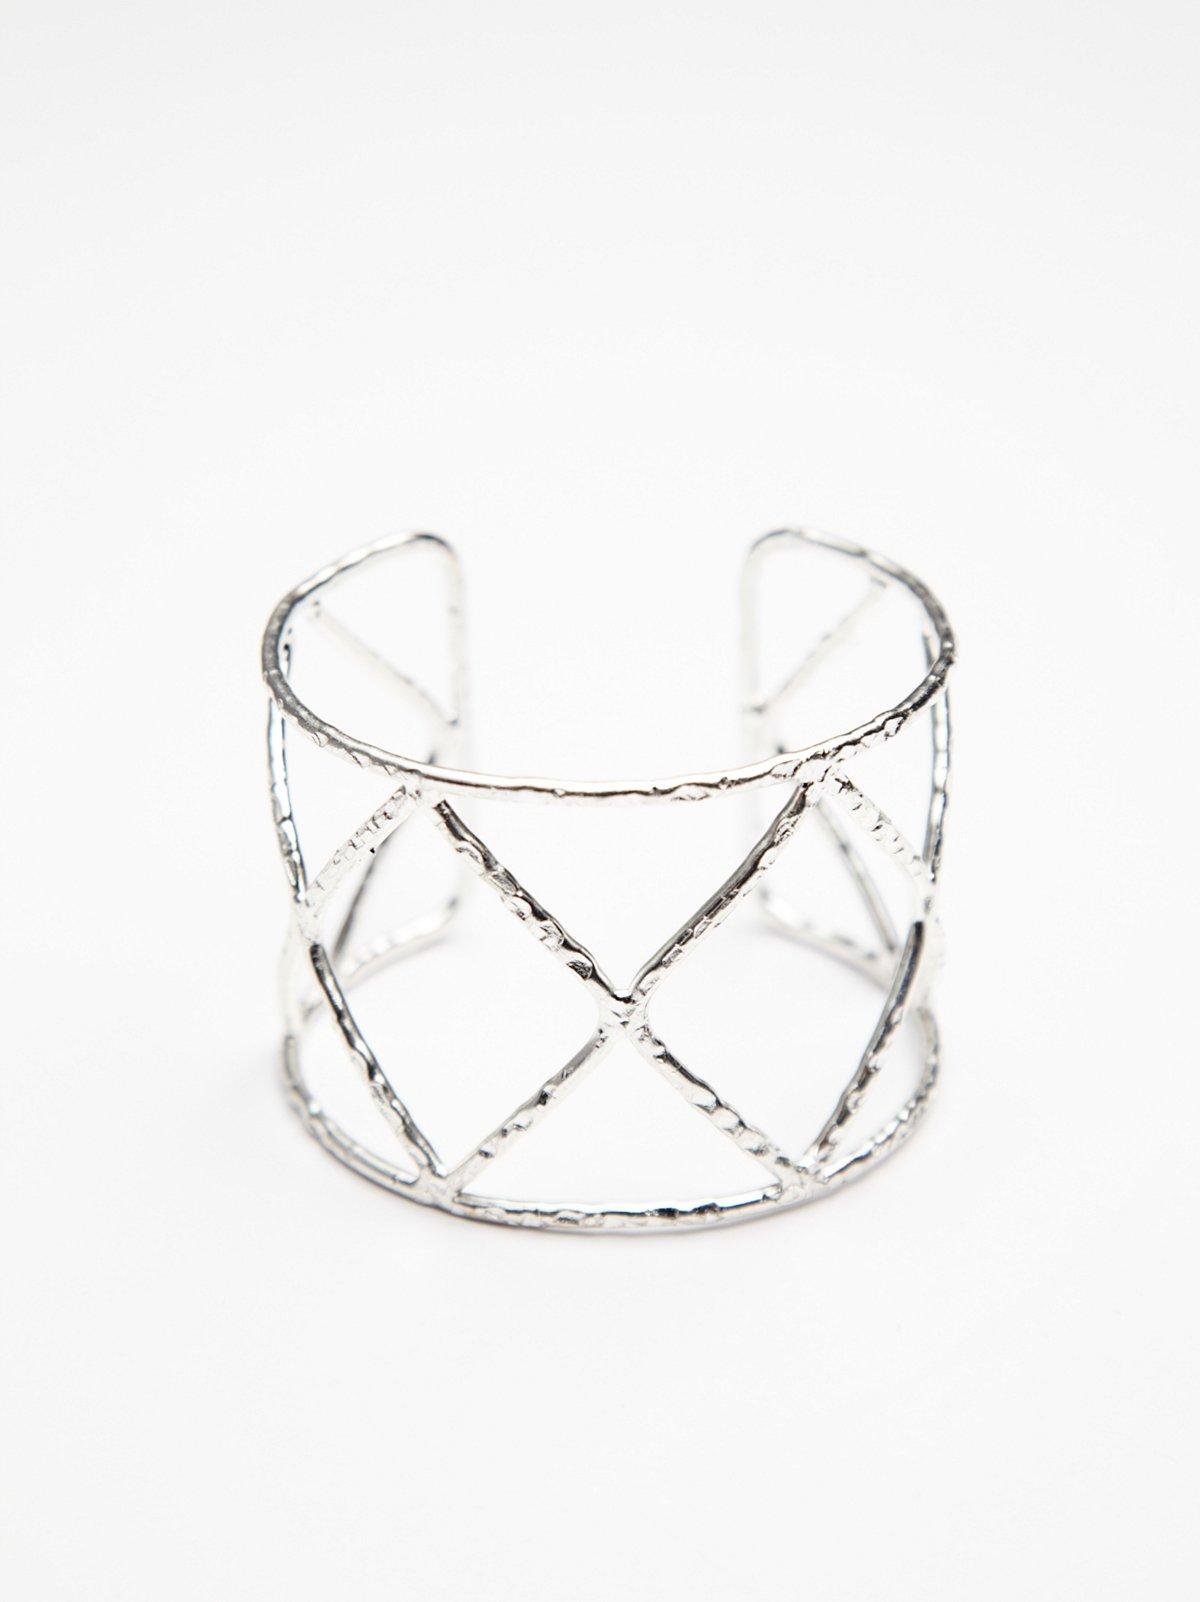 Caged Cuff